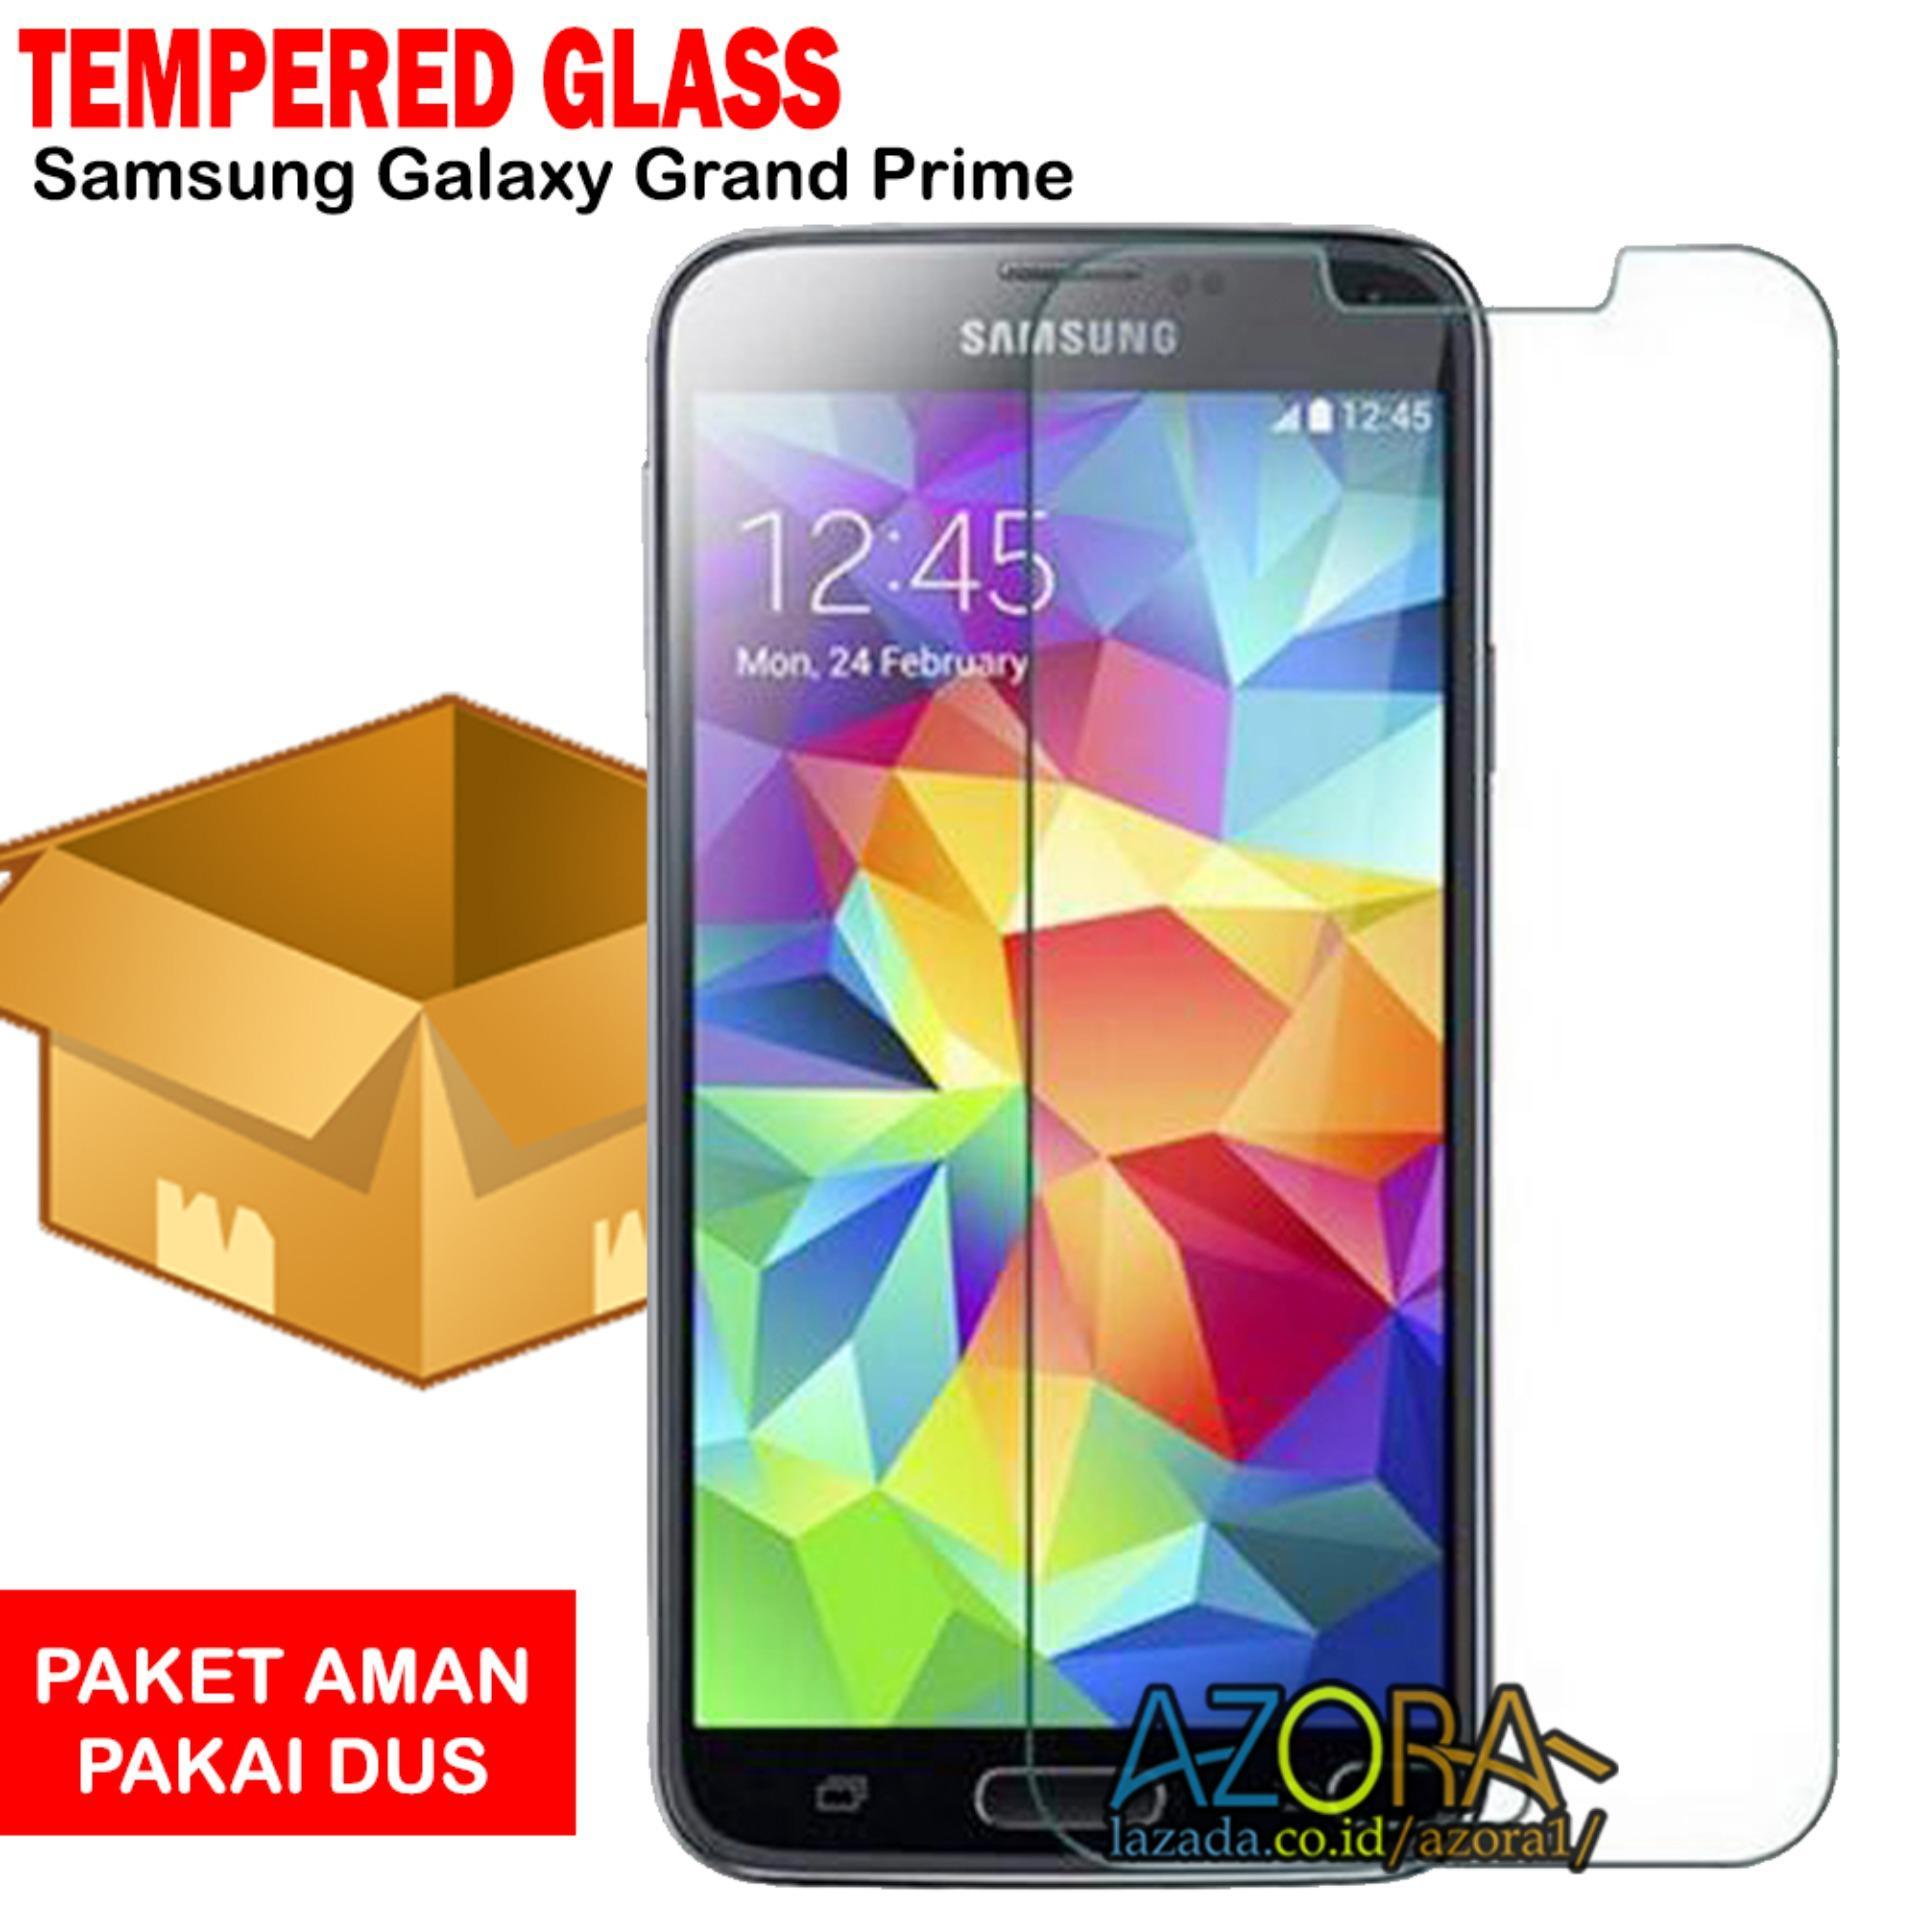 Tempered Glass Samsung Galaxy Grand Prime G530 Screen Protector Pelindung Layar Kaca Anti Gores - Bening